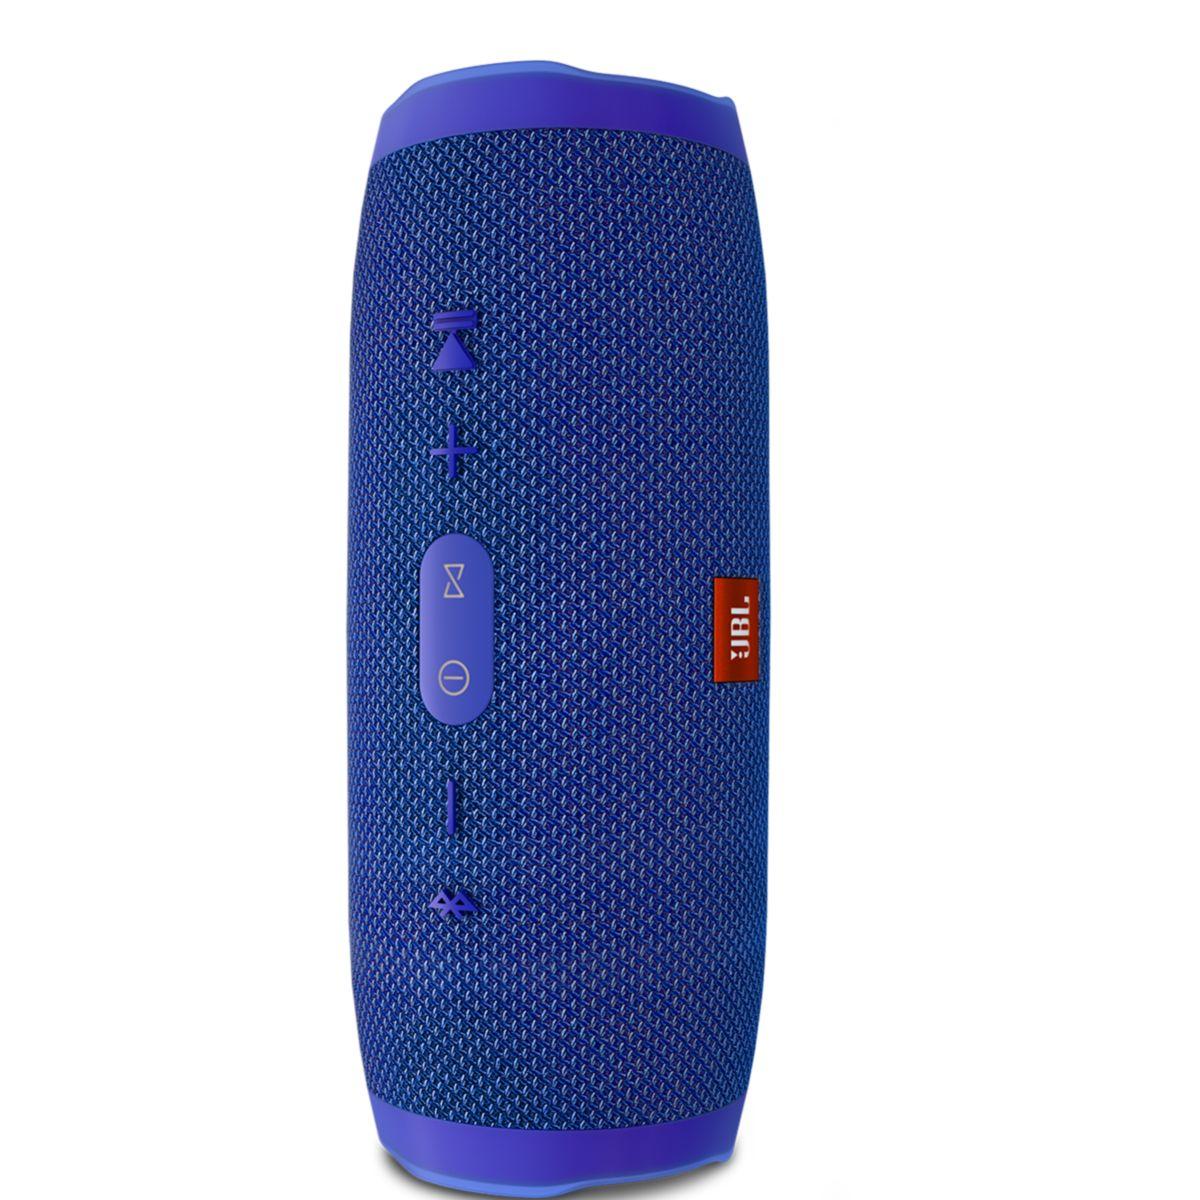 Enceinte Bluetooth JBL Charge 3 bleu